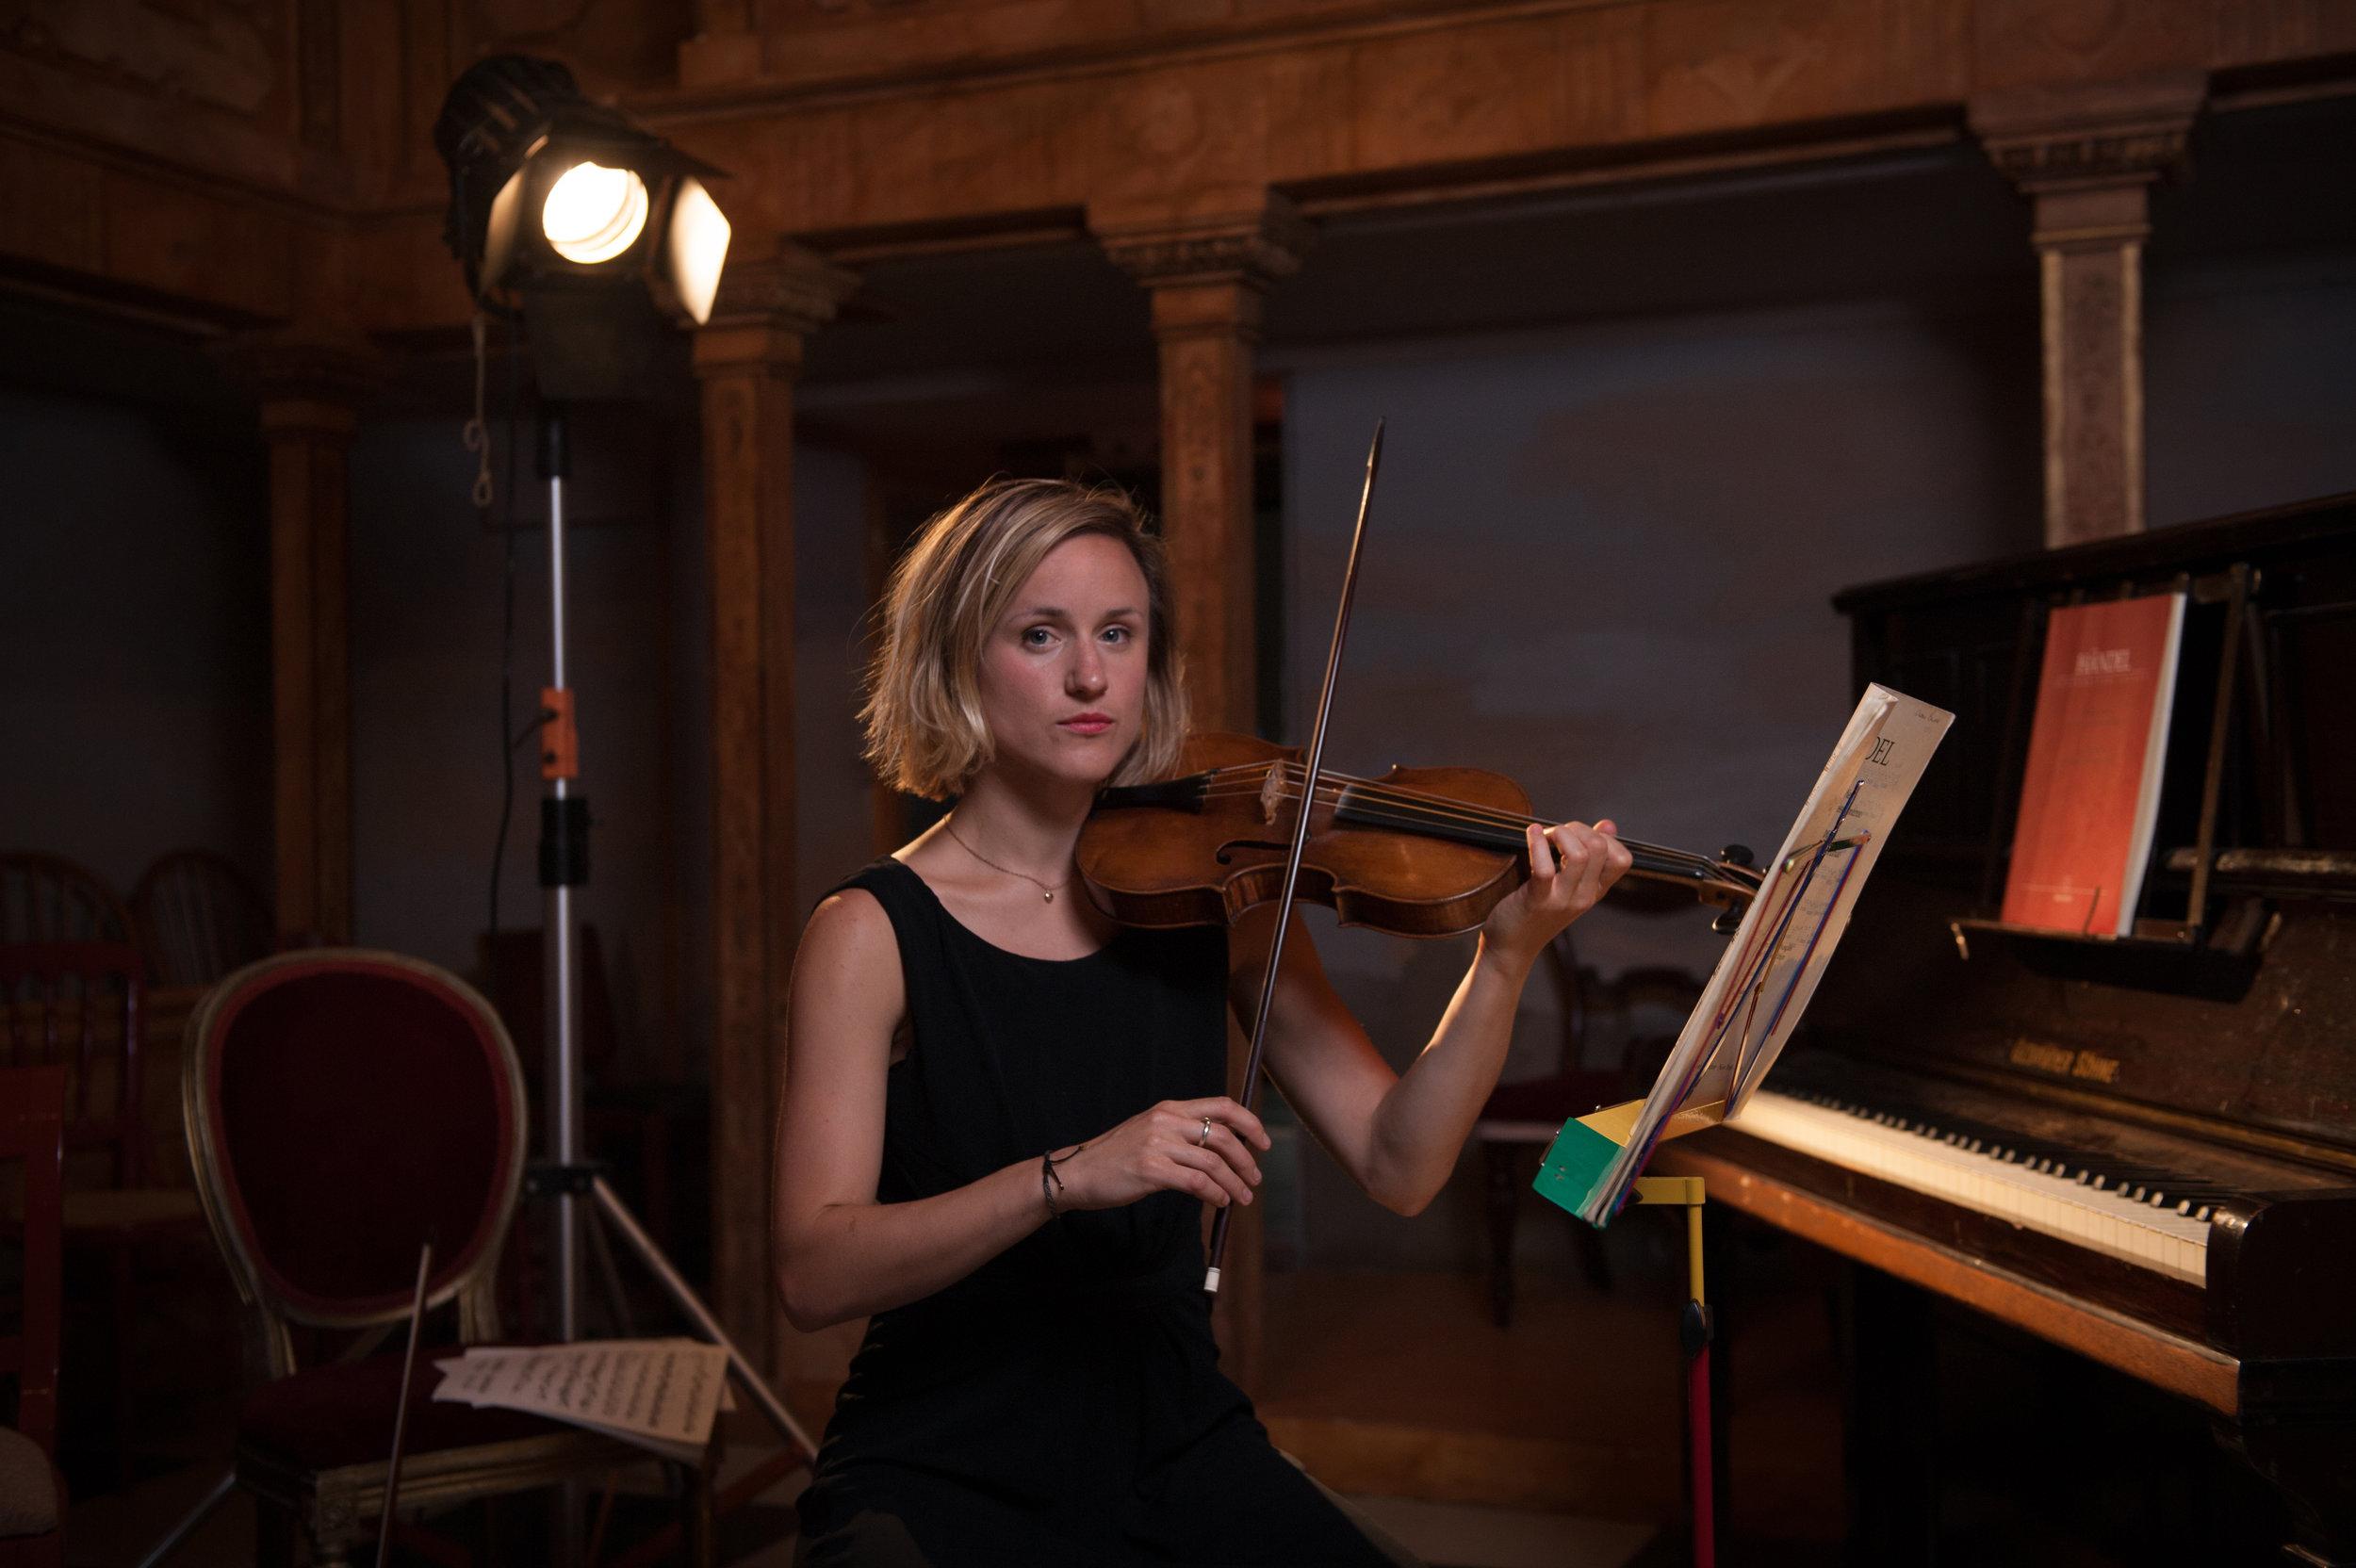 Naomi, The Violinist